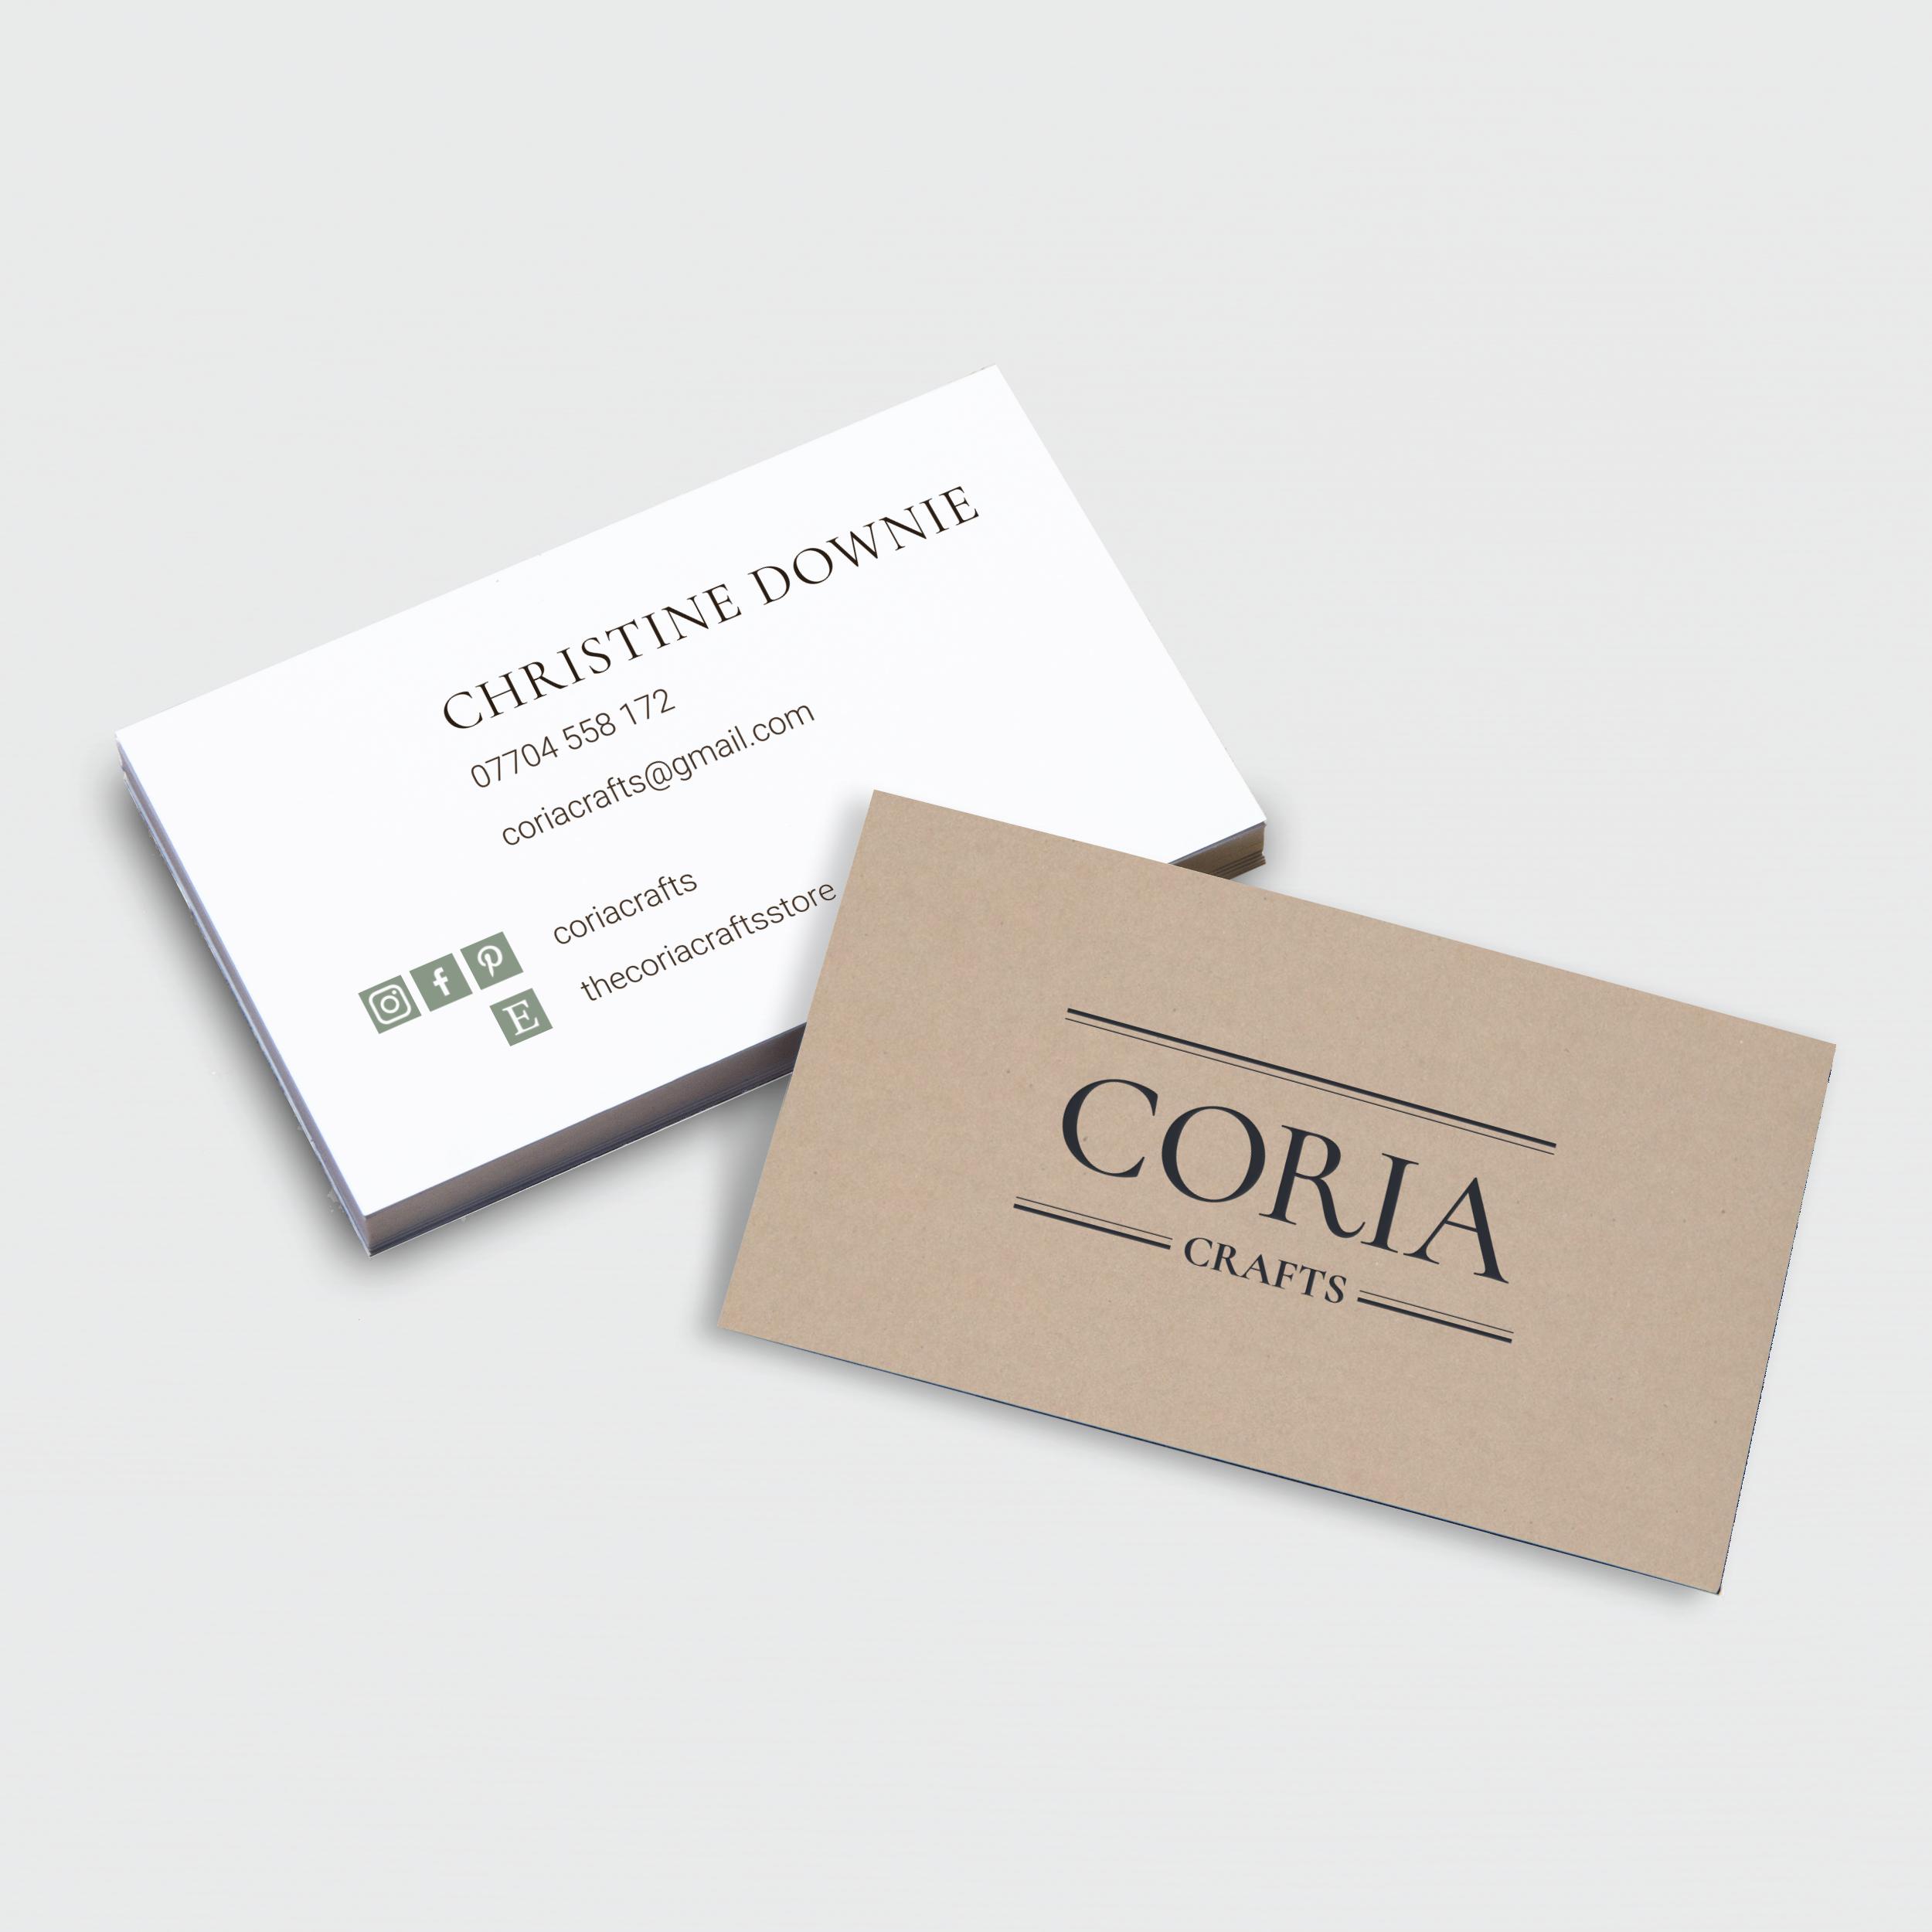 Coria Crafts Business Cards